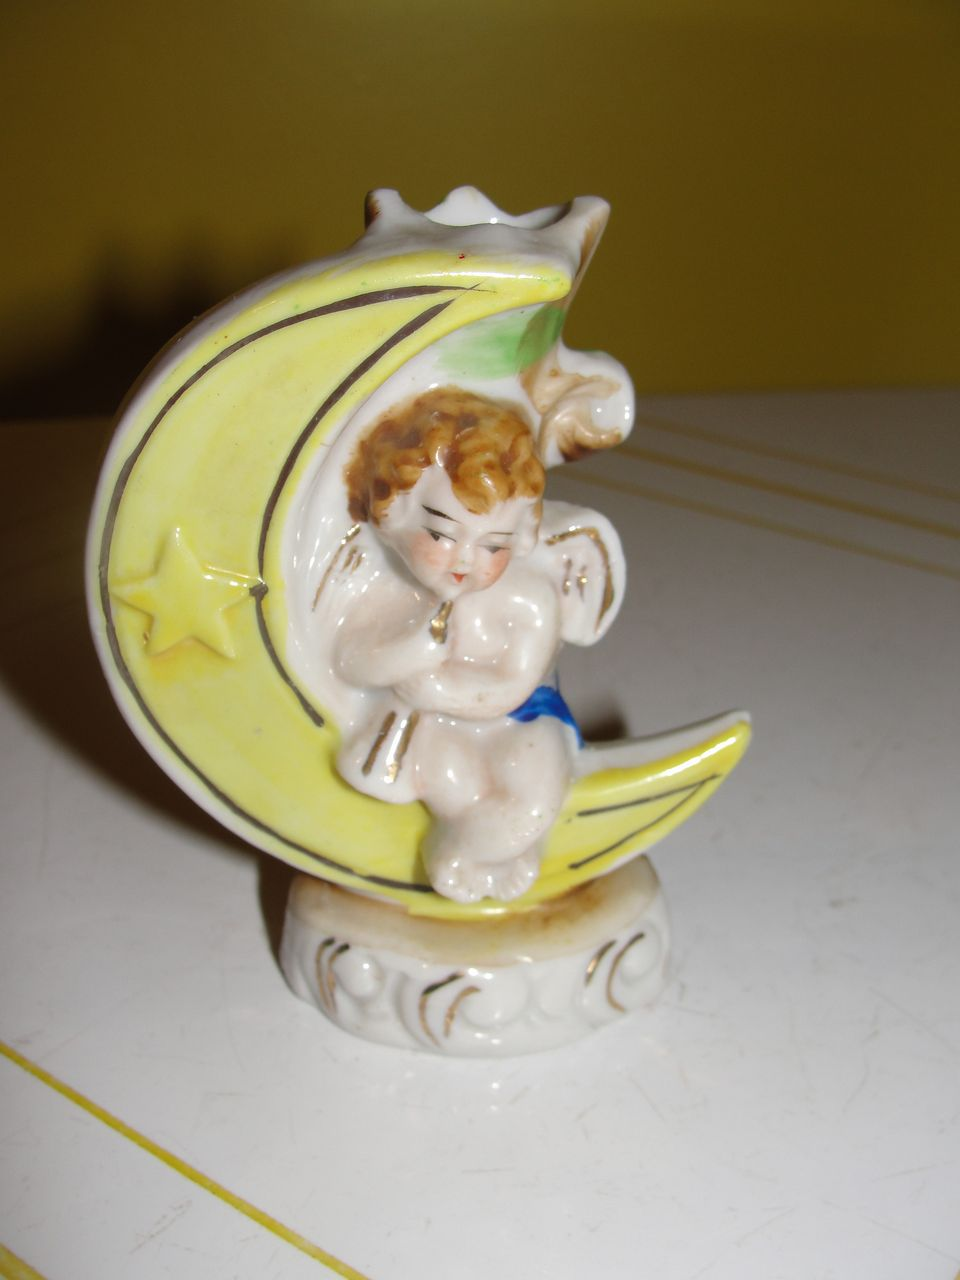 Occupied Japan Cherub on crescent moon Figural Vase - b21